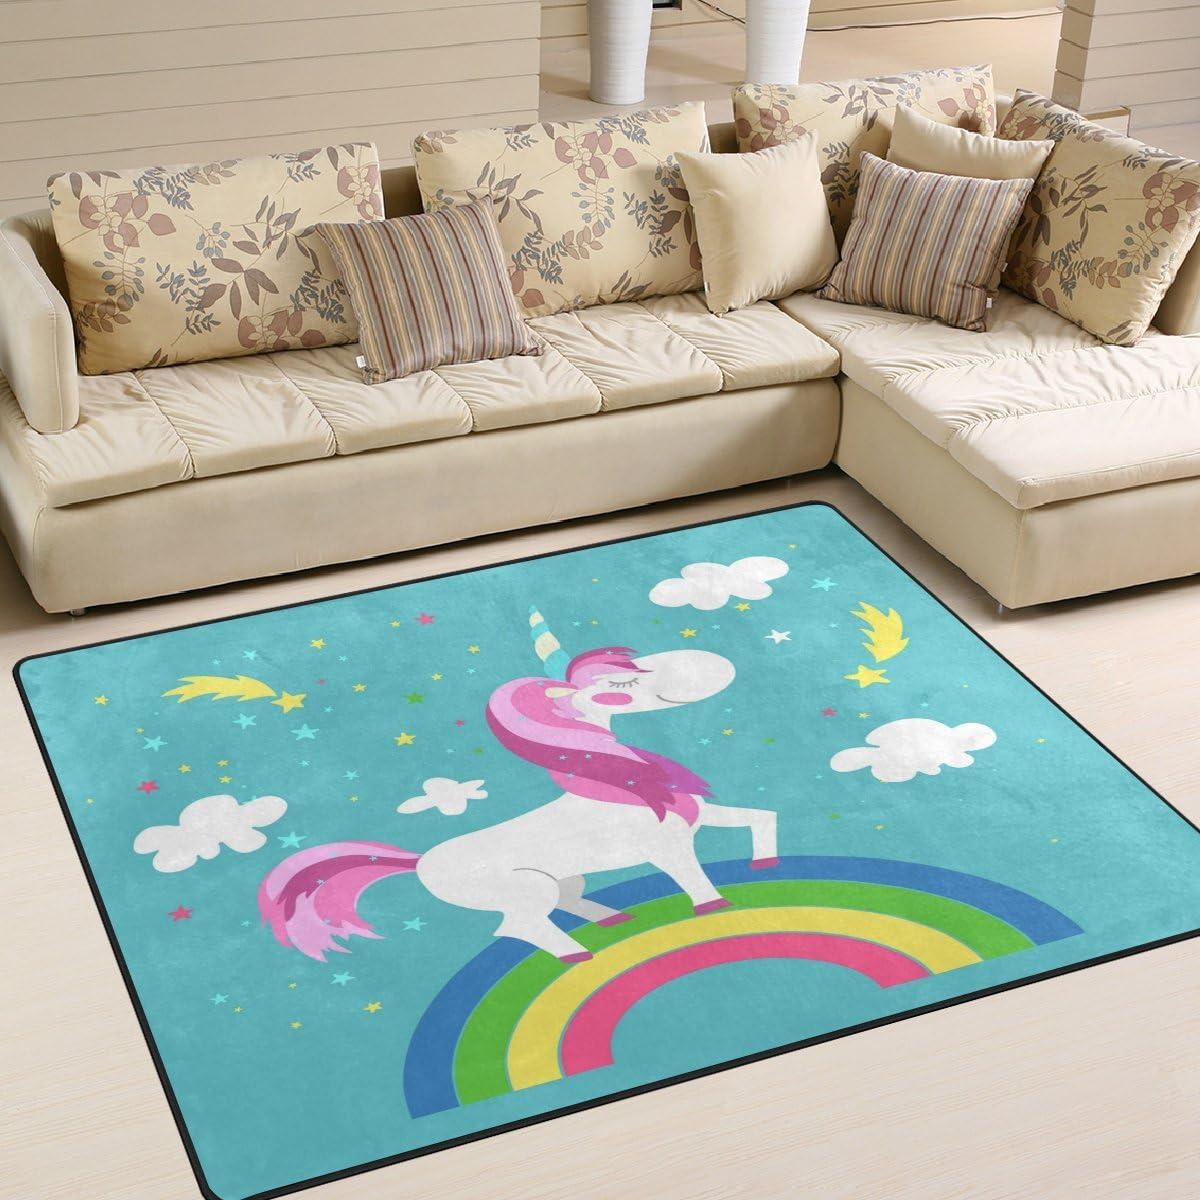 Use7 - Alfombra para salón o Dormitorio con diseño de ...